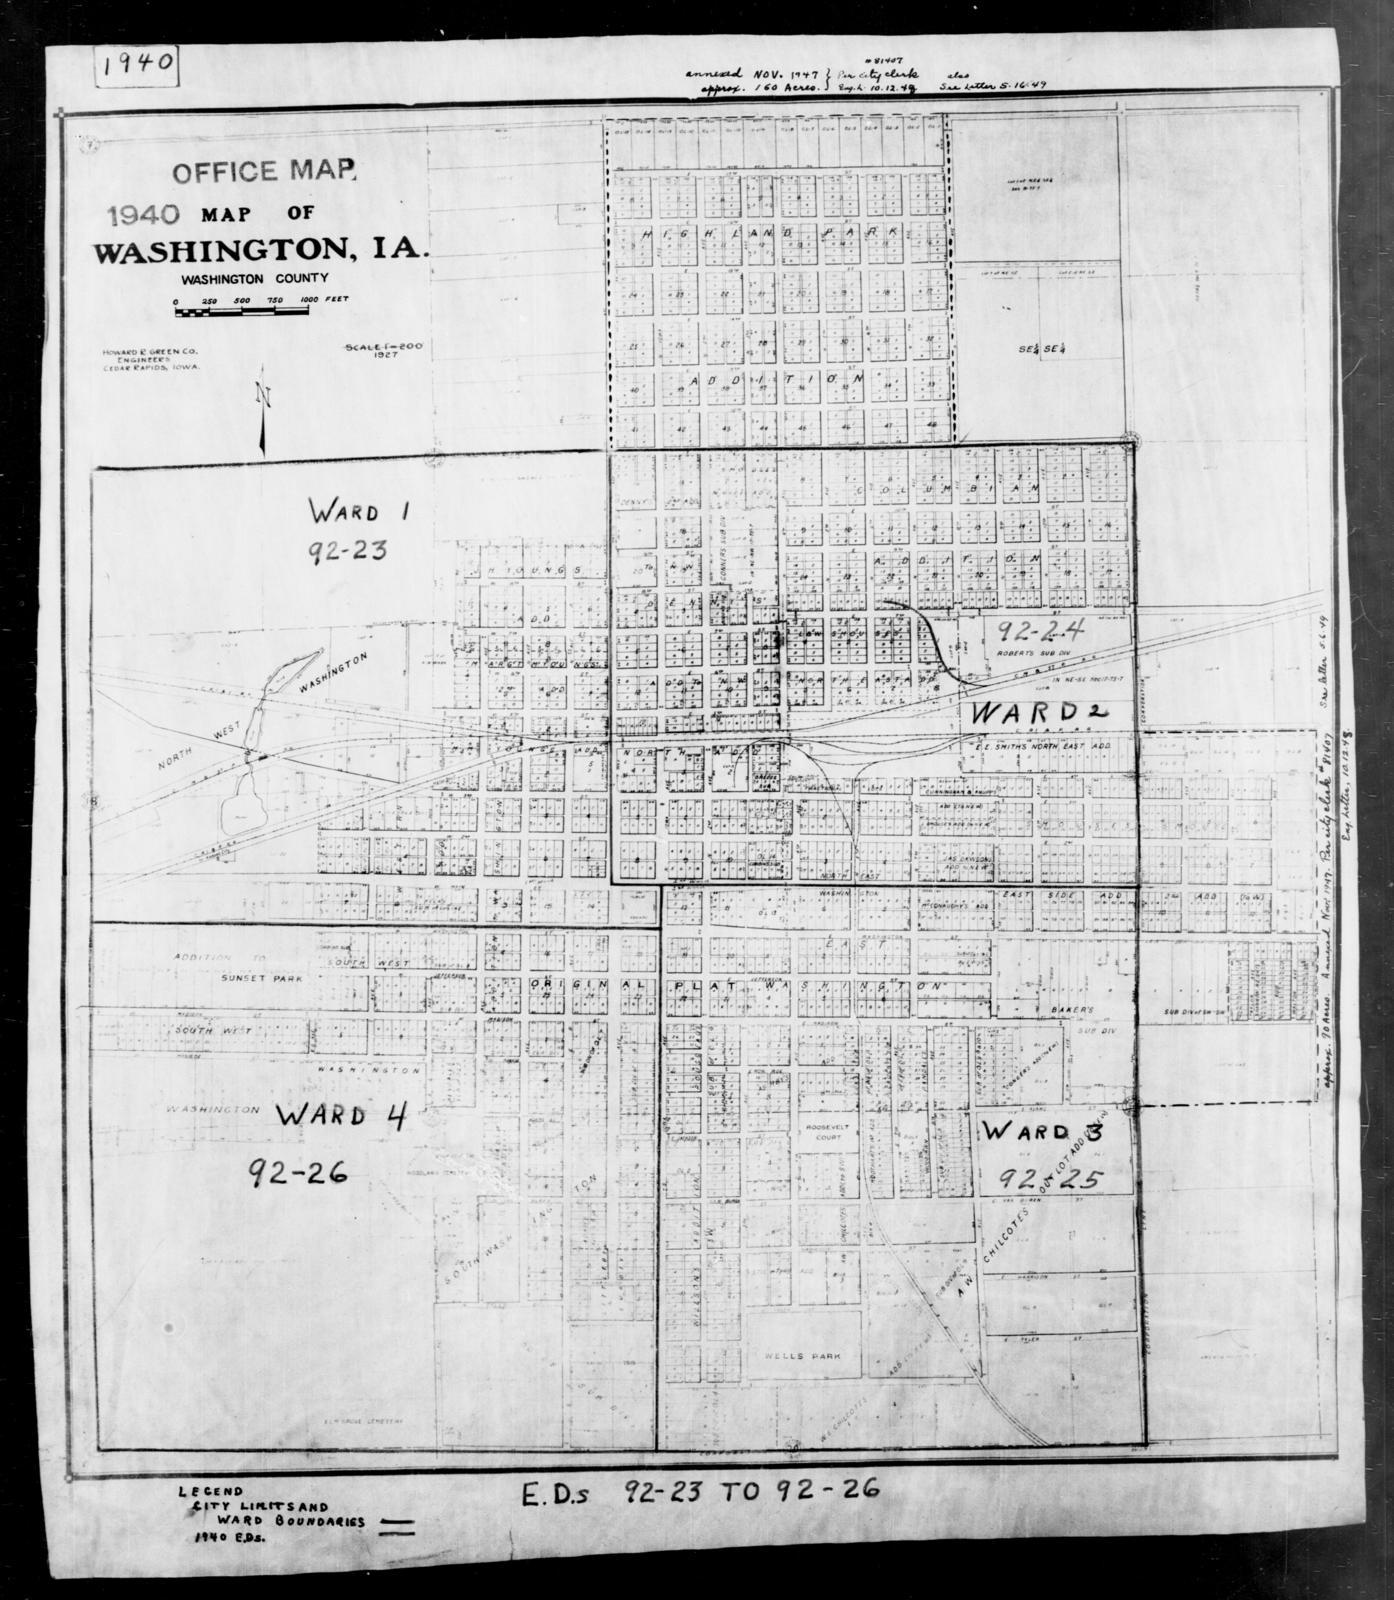 Washington County Iowa Map.1940 Census Enumeration District Maps Iowa Washington County